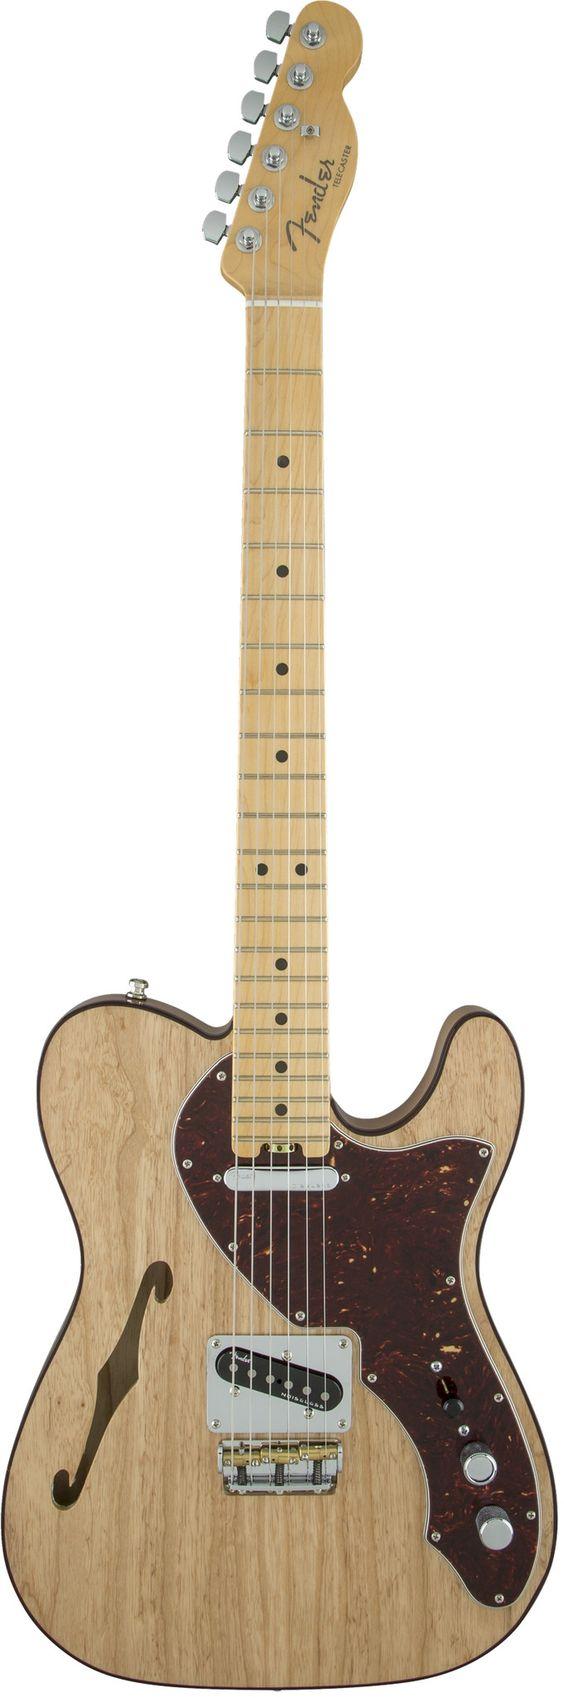 Fender American Elite Telecaster Thinline Electric Guitar